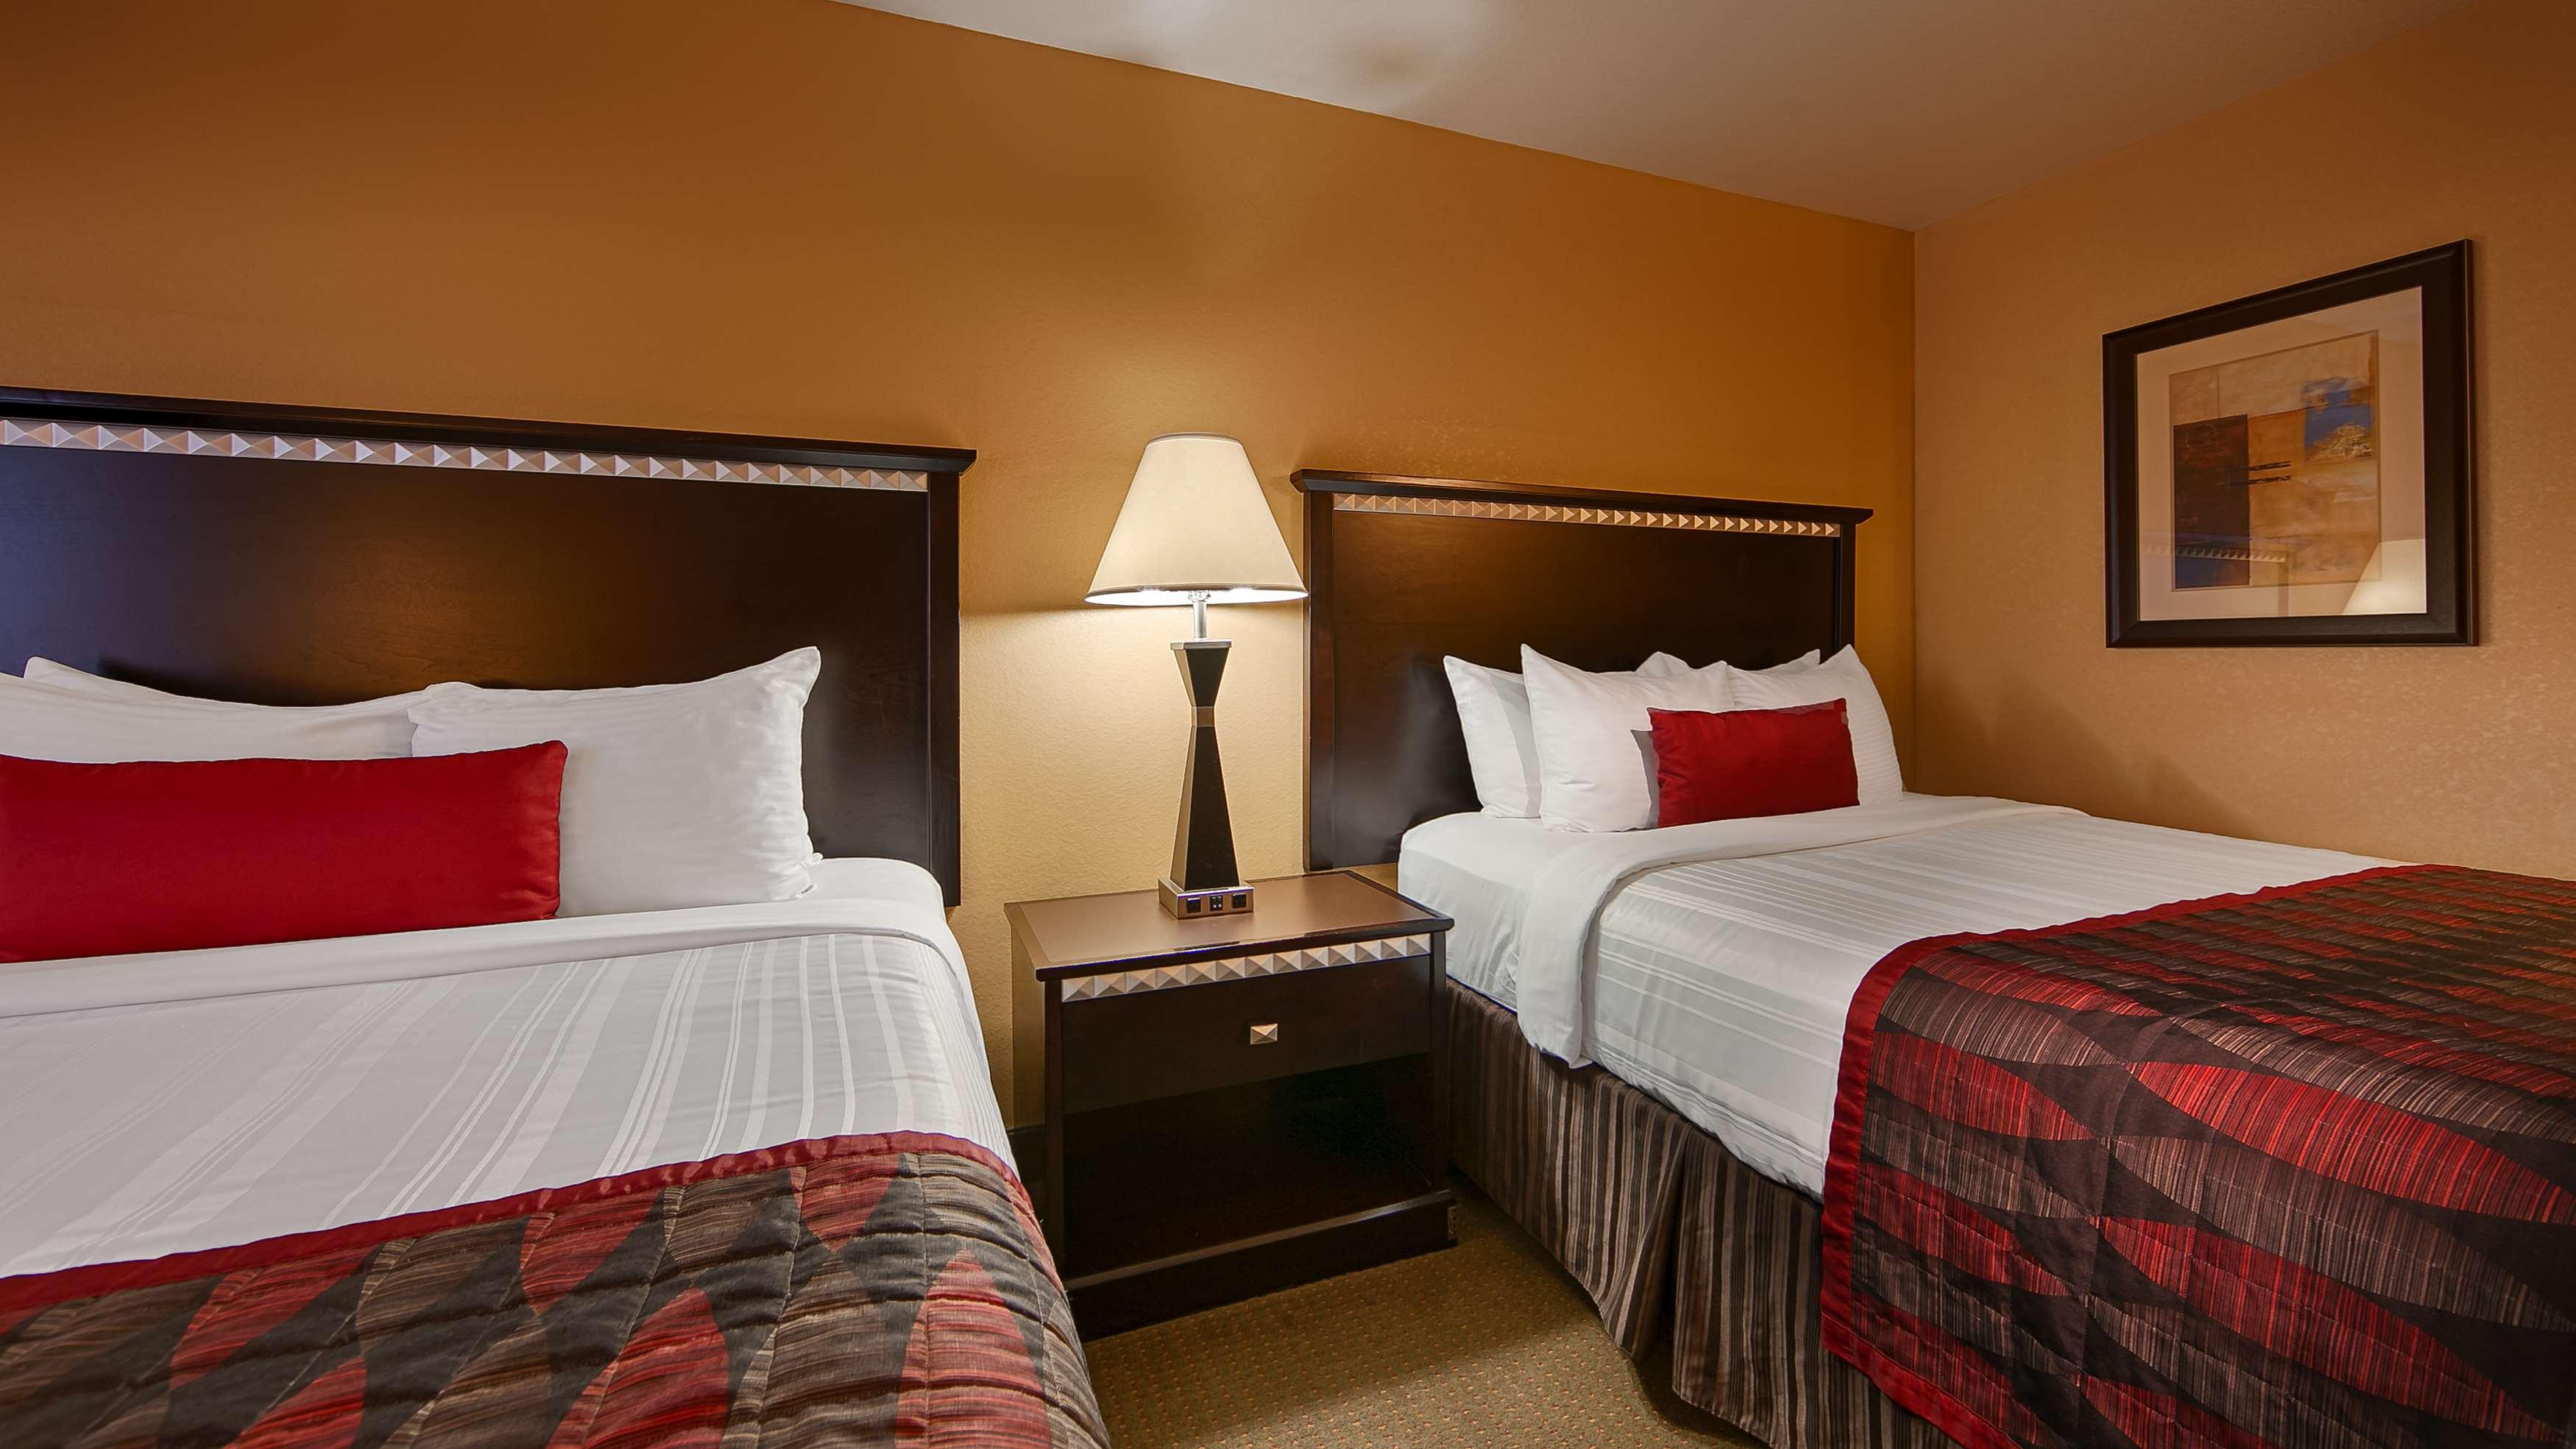 Best Western Plus Bessemer Hotel & Suites image 11